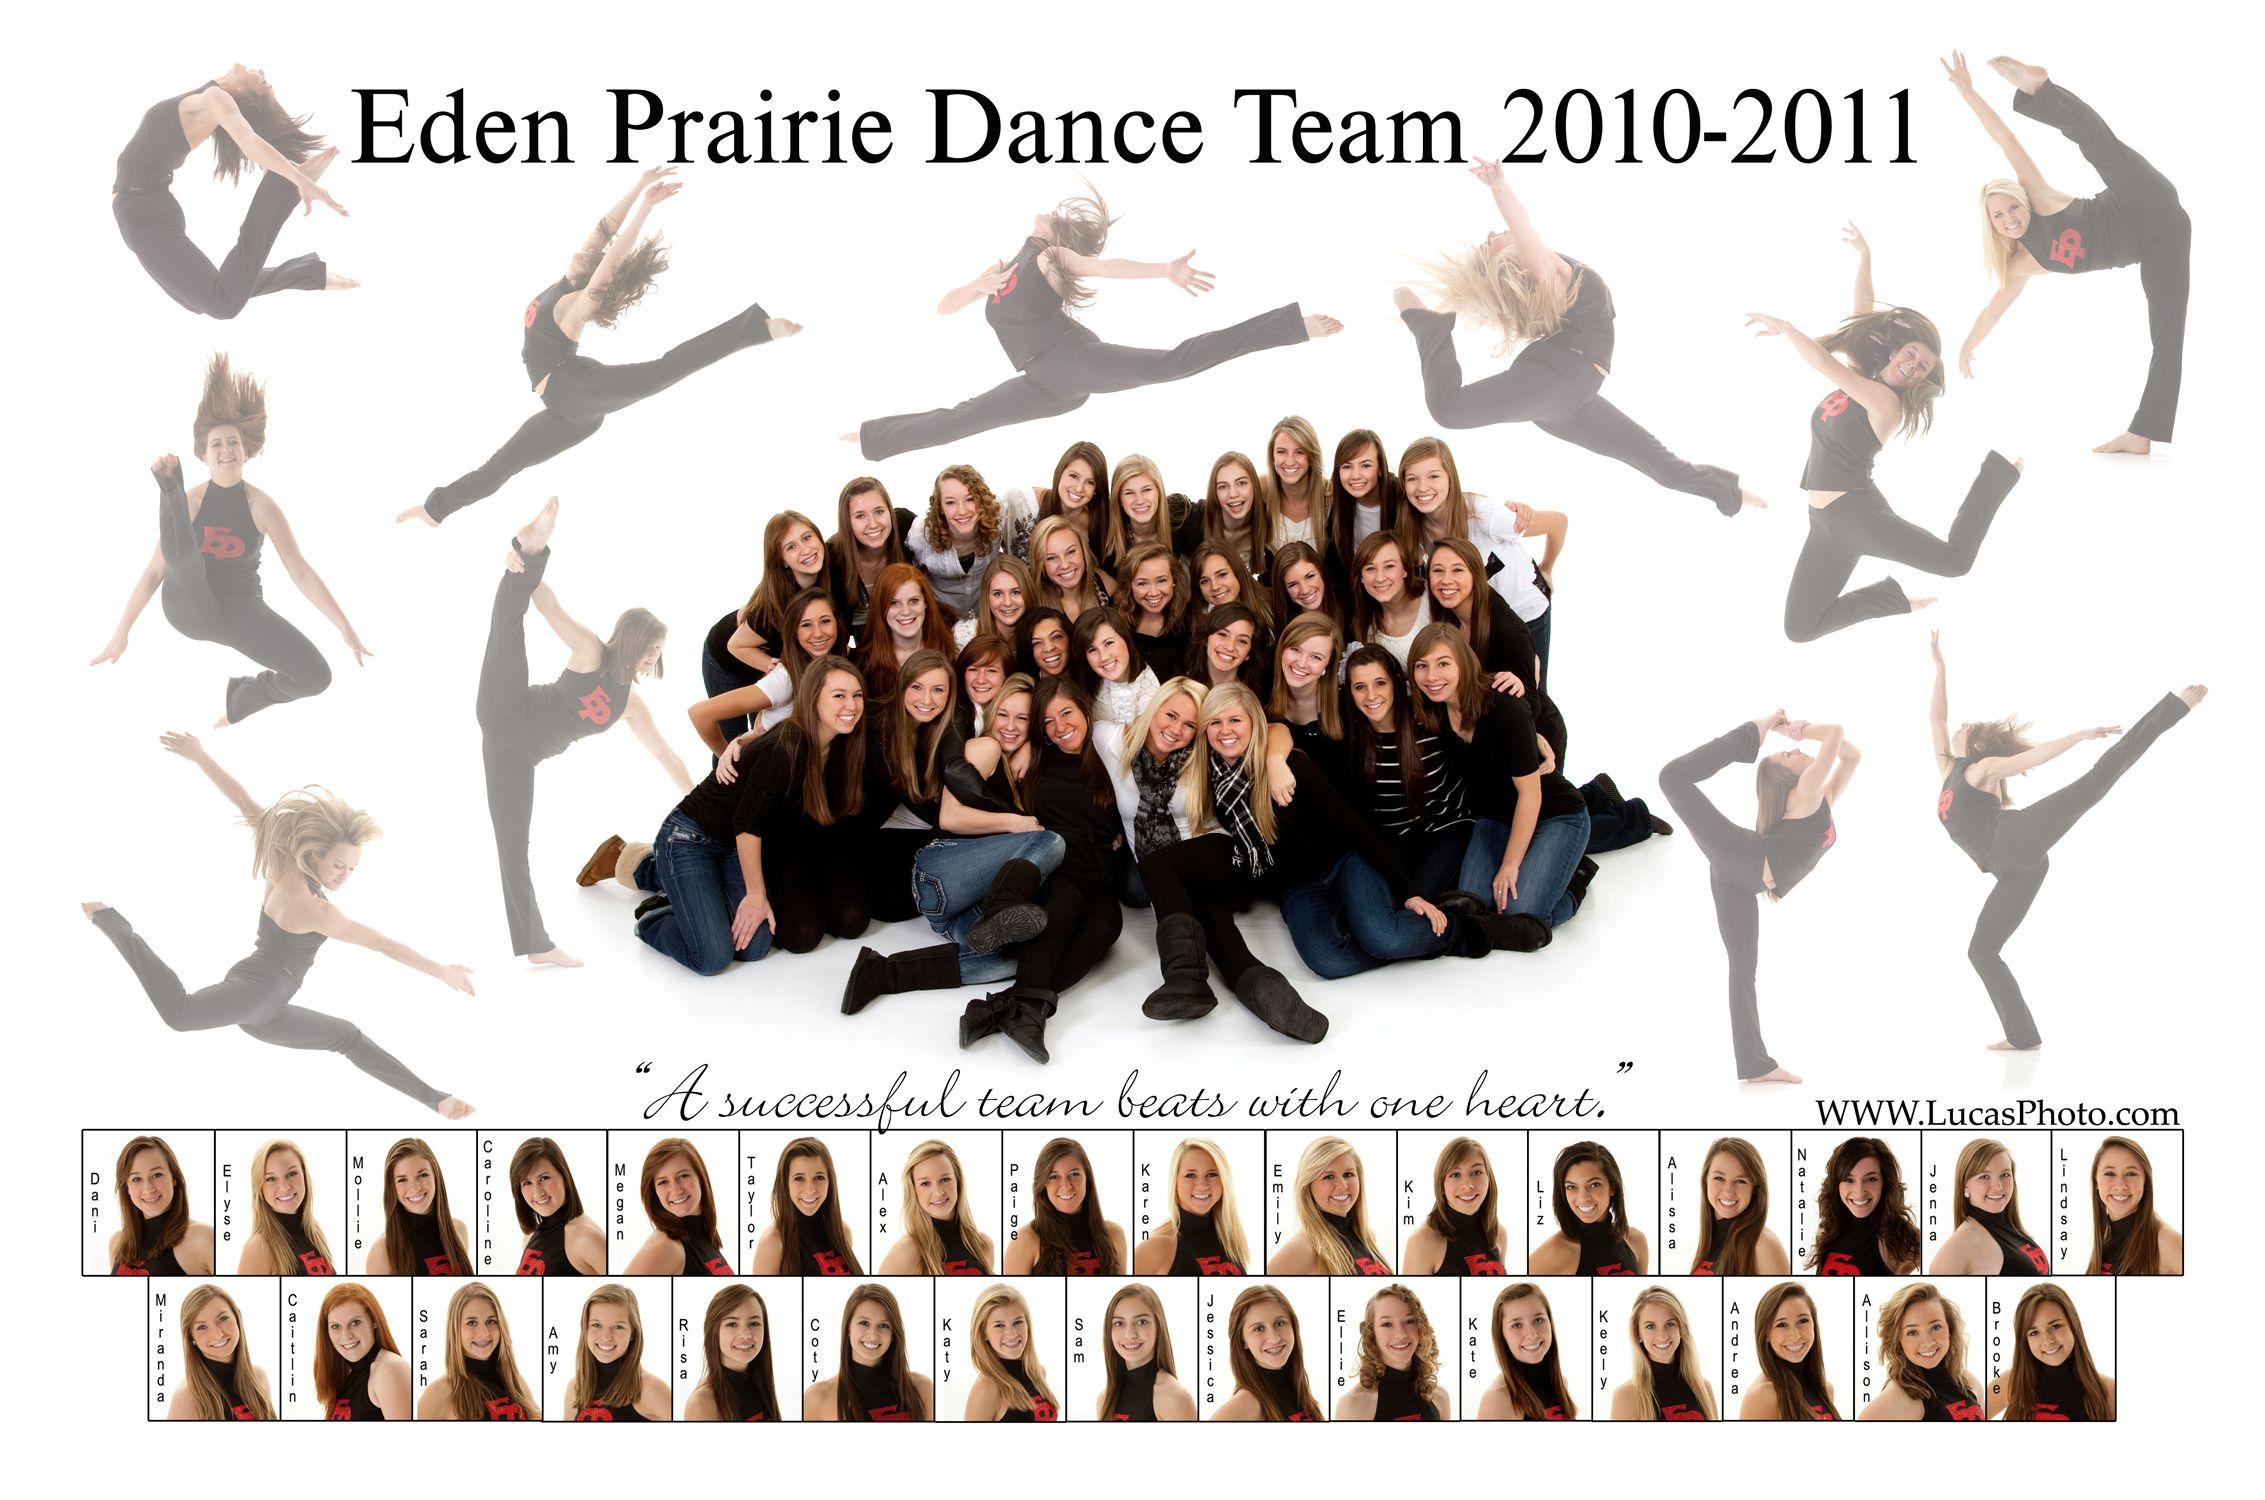 Dance Team Poster Dance Teams Dance Team Pictures Dance Team Photos